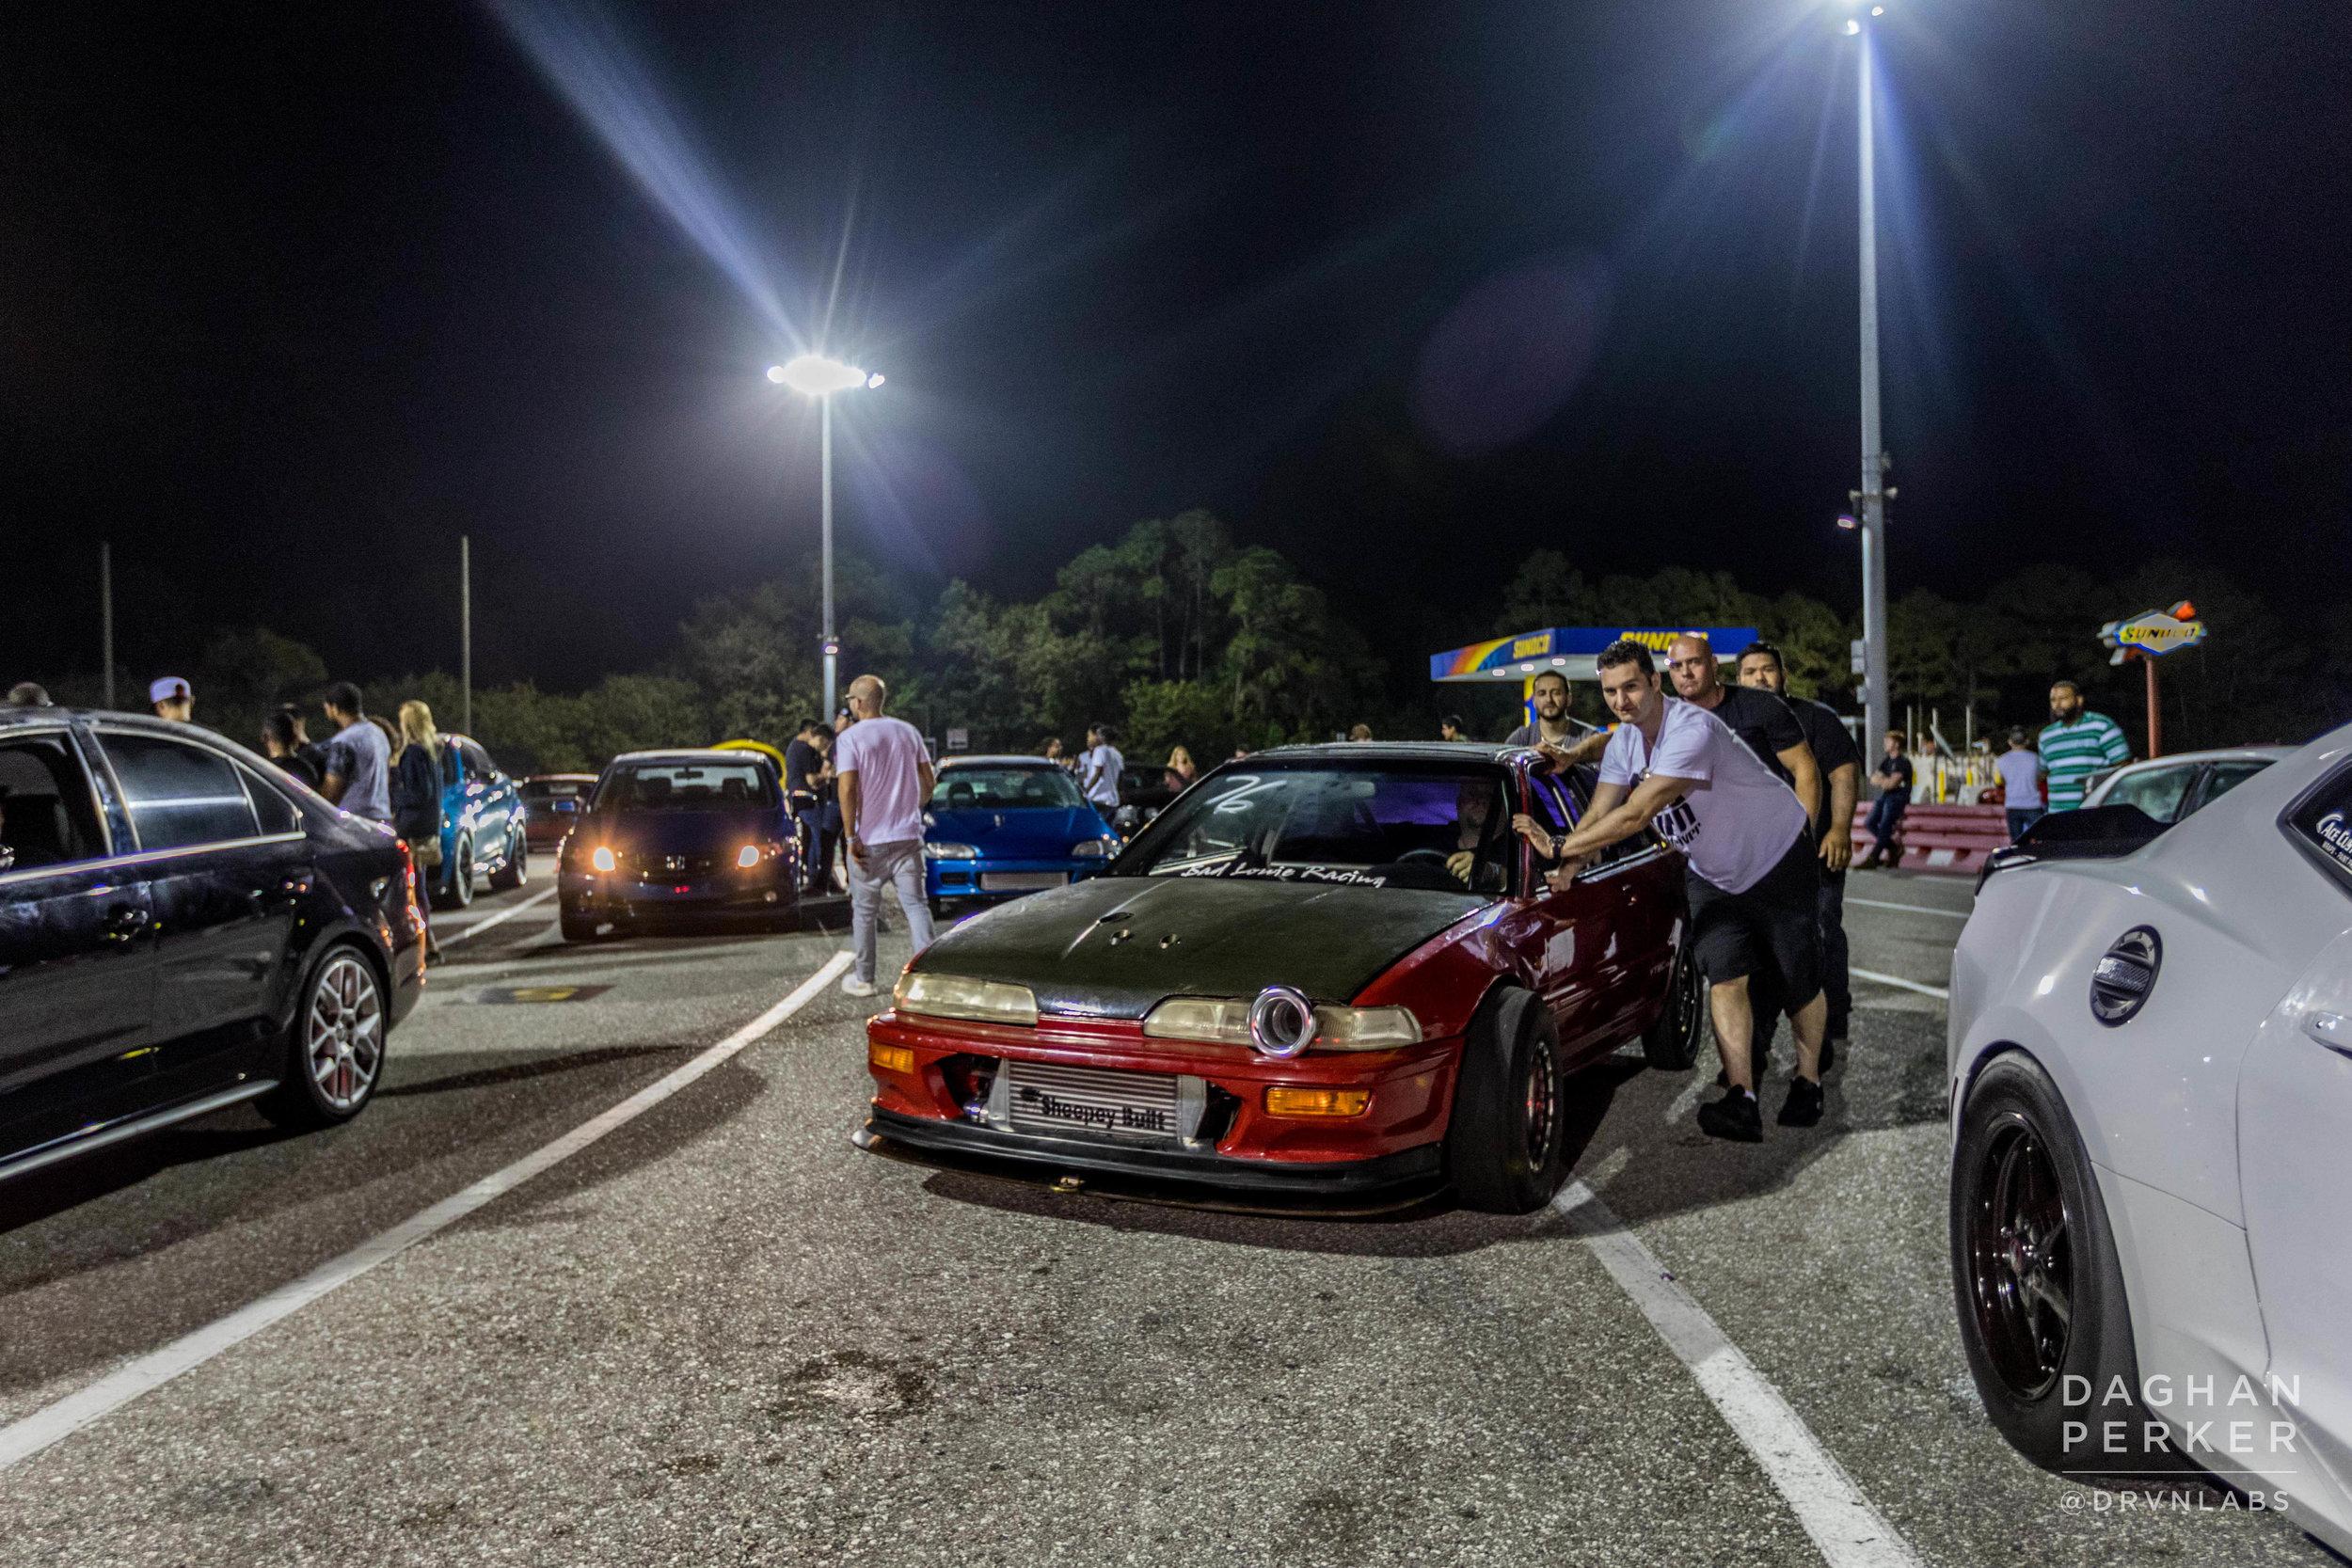 180210-Miami_cars-1607.jpg